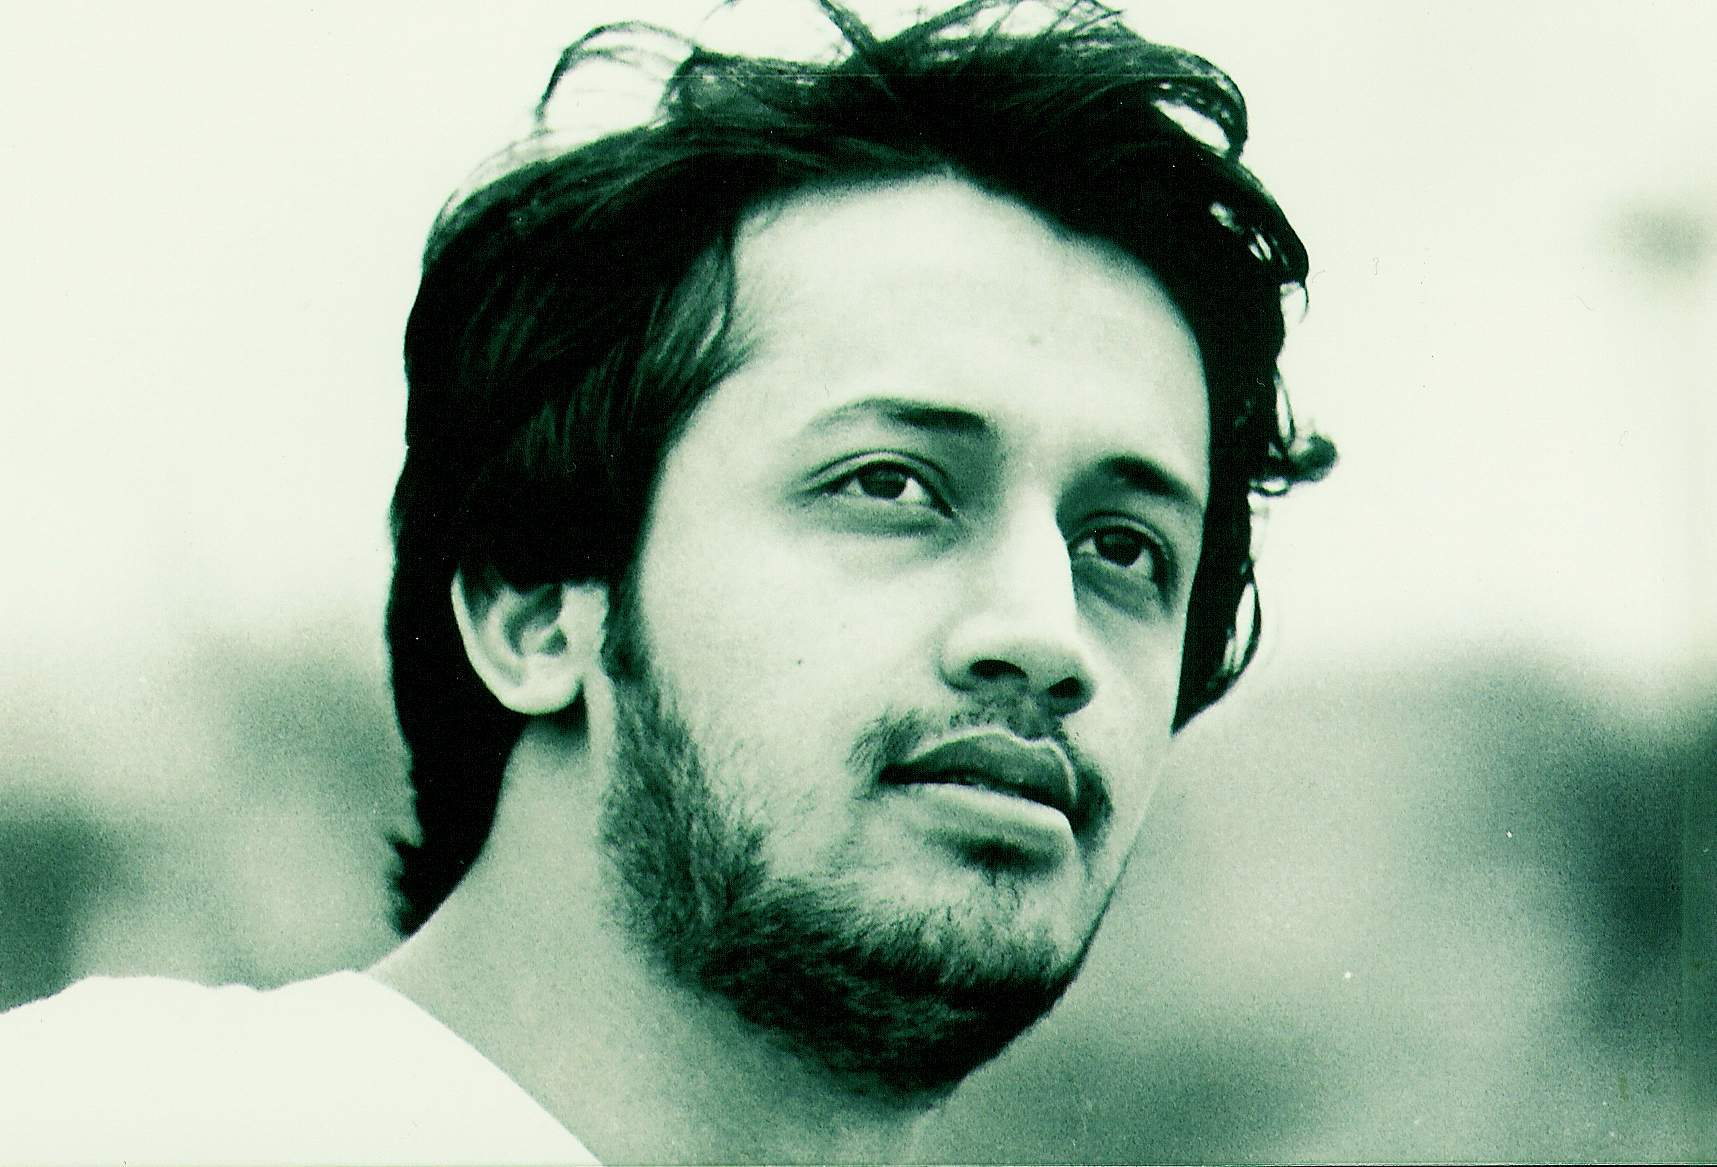 Atif Aslam Background